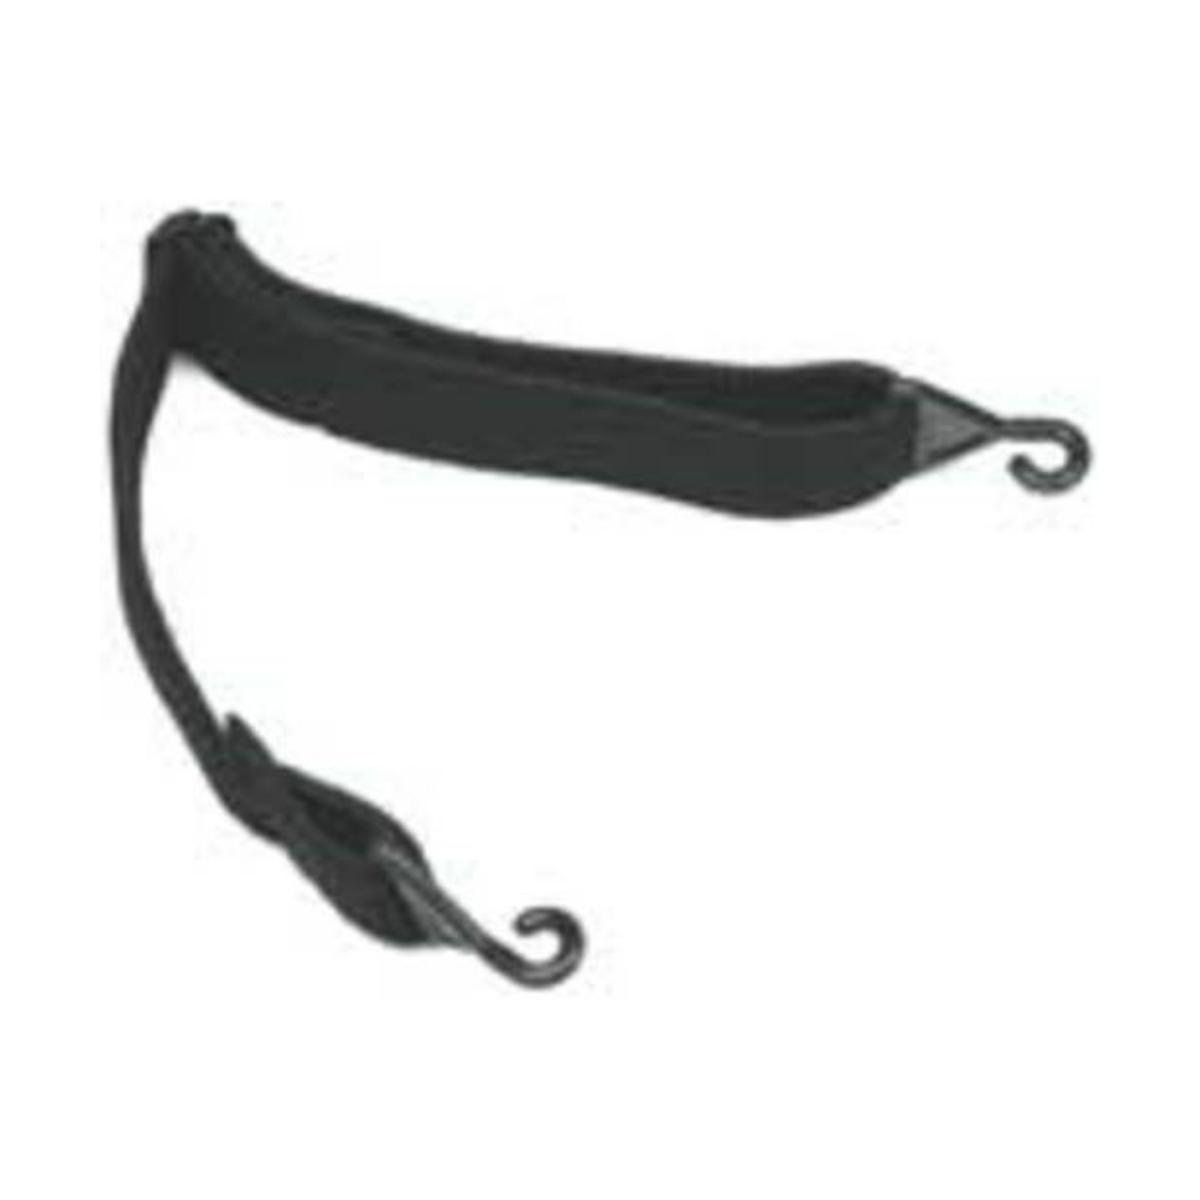 HF0941_Adjustable Elasticated Chin Strap